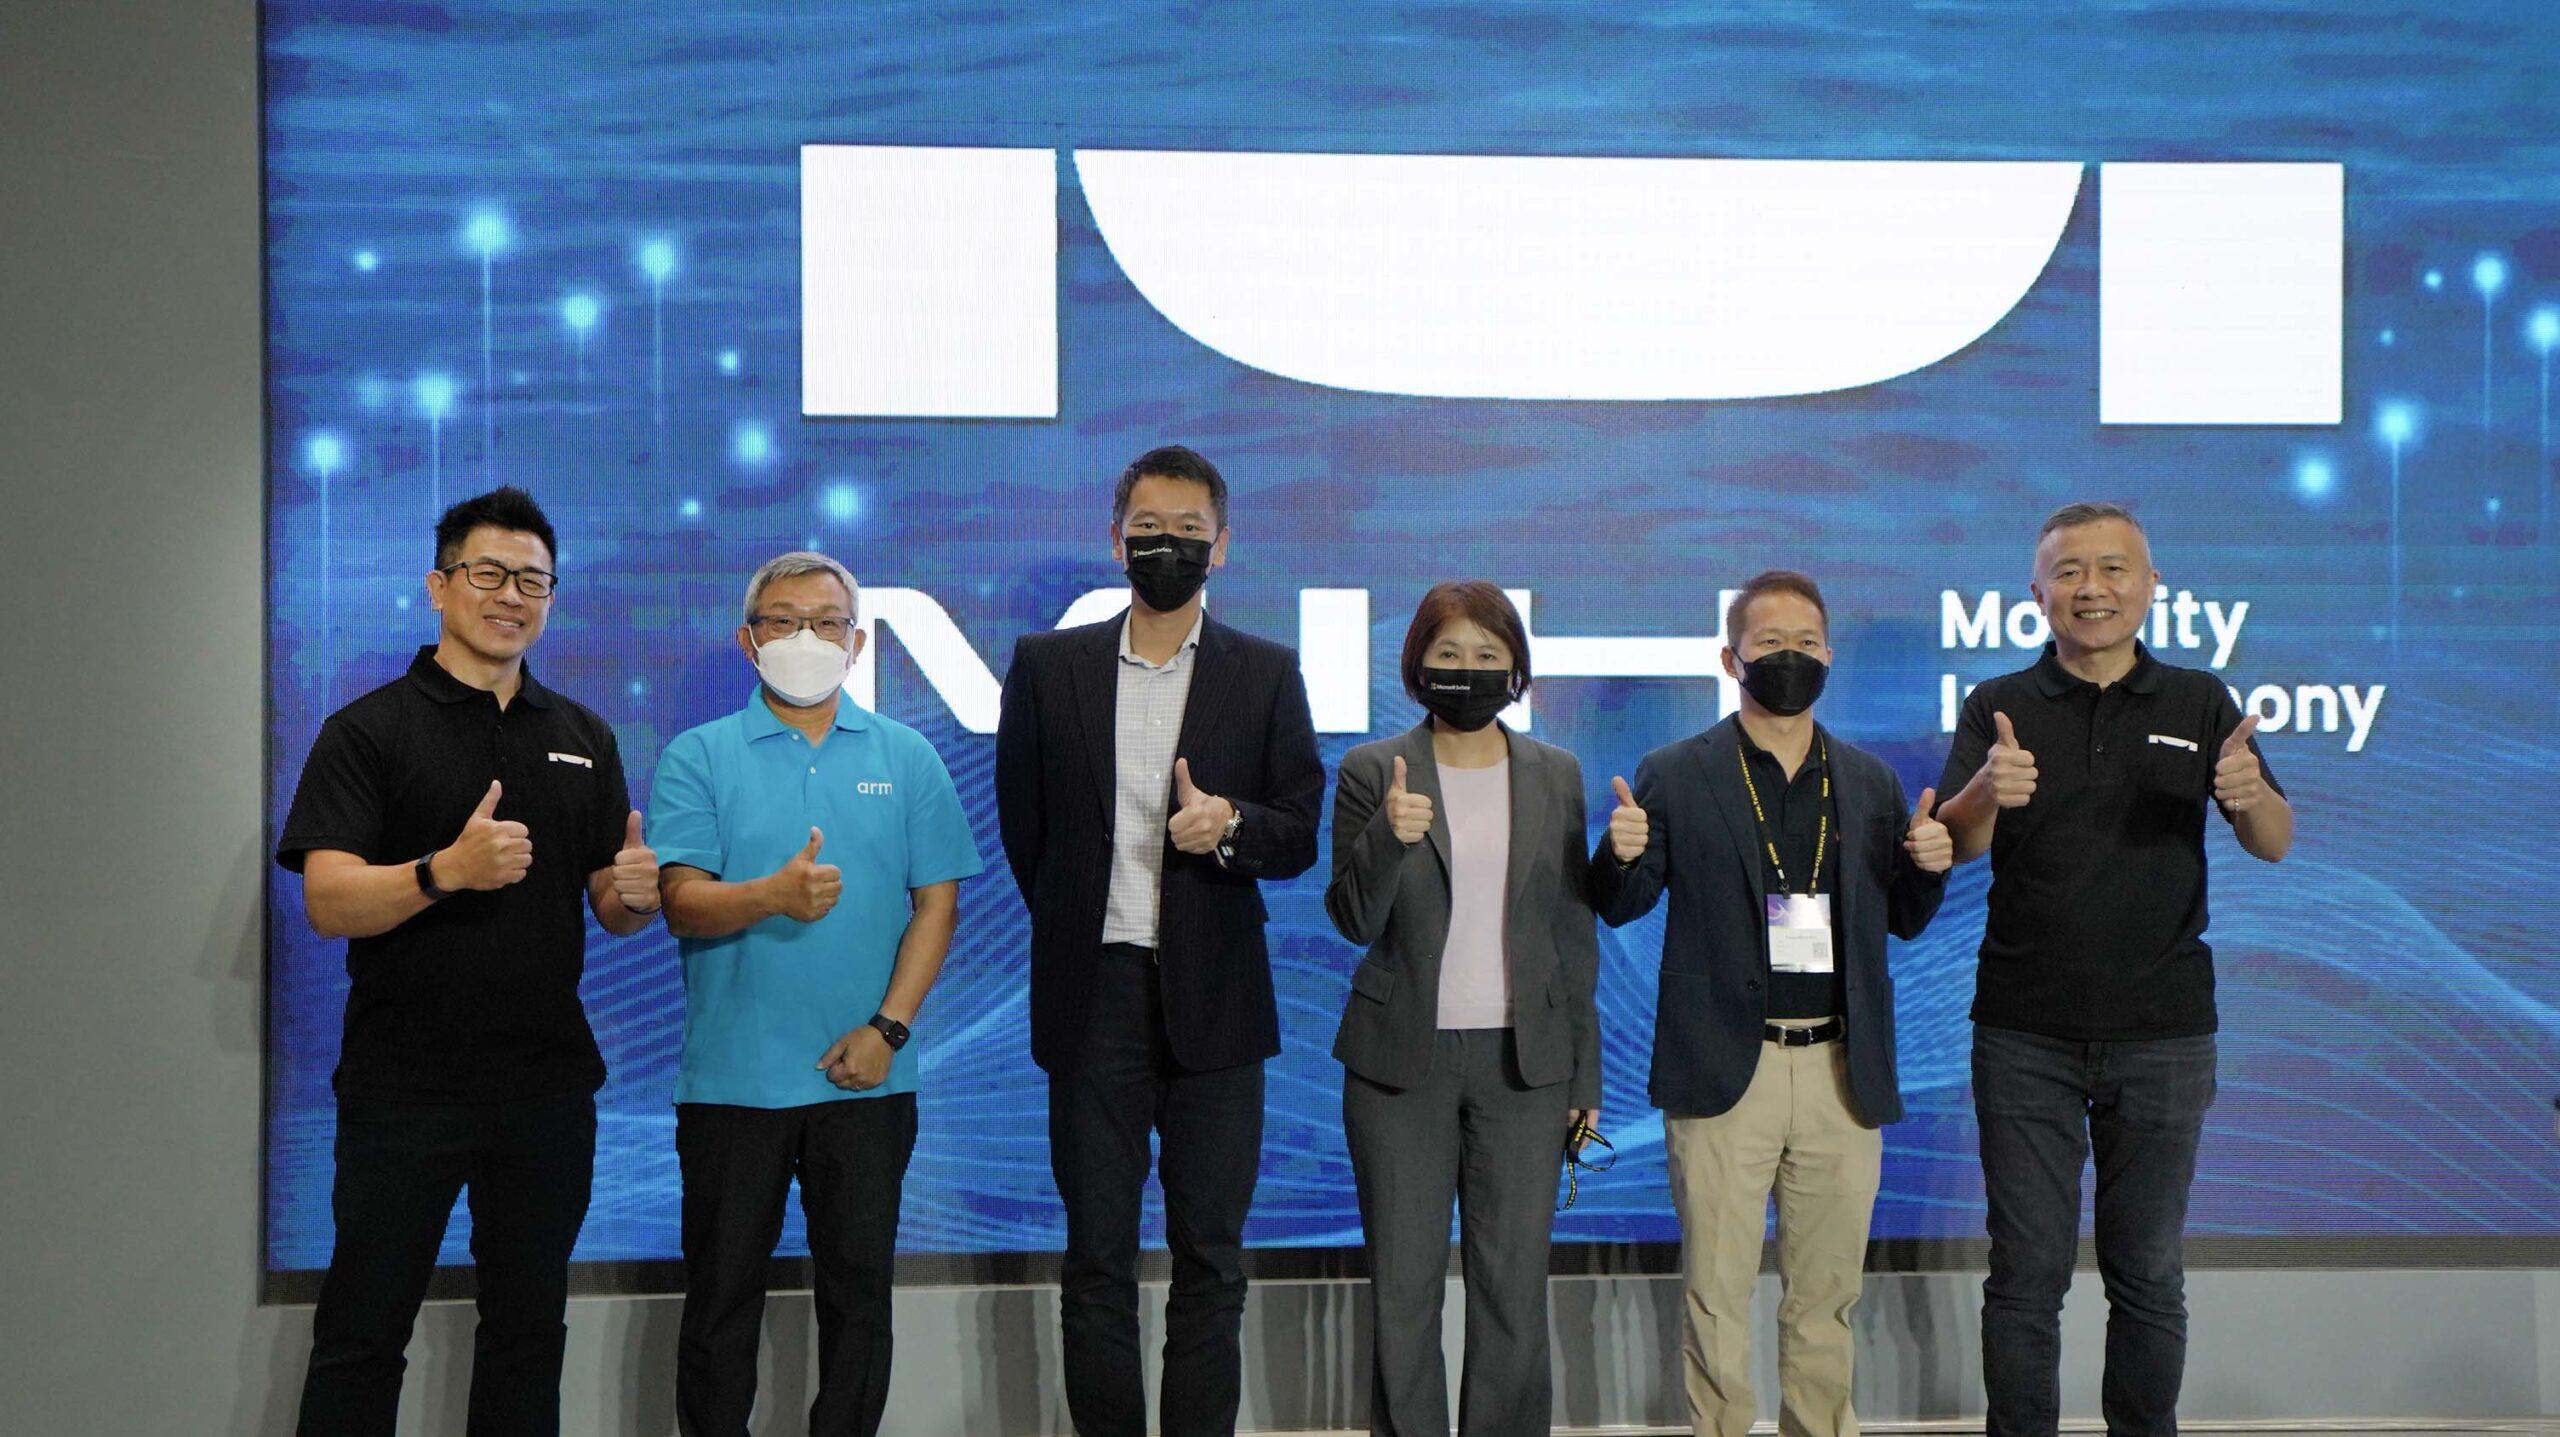 MIH正式推出Open EV Platform軟體平台,並宣布與Arm、微軟和趨勢科技達成結盟